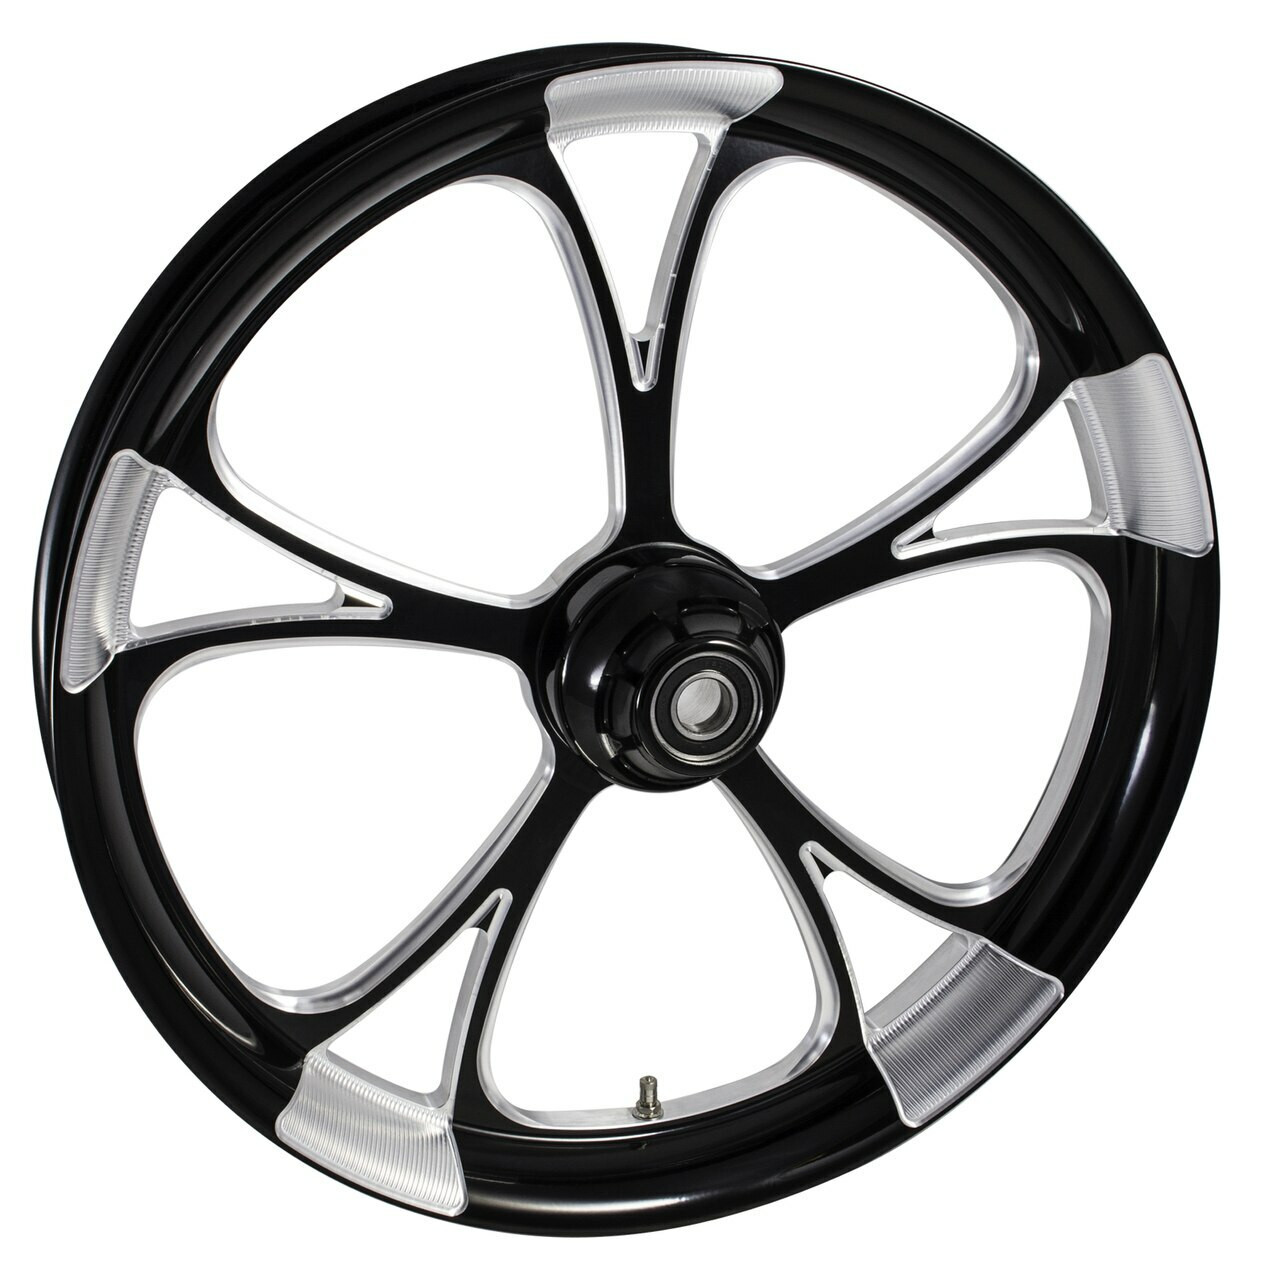 Harley Davidson Black Contrast Breakout Wheels